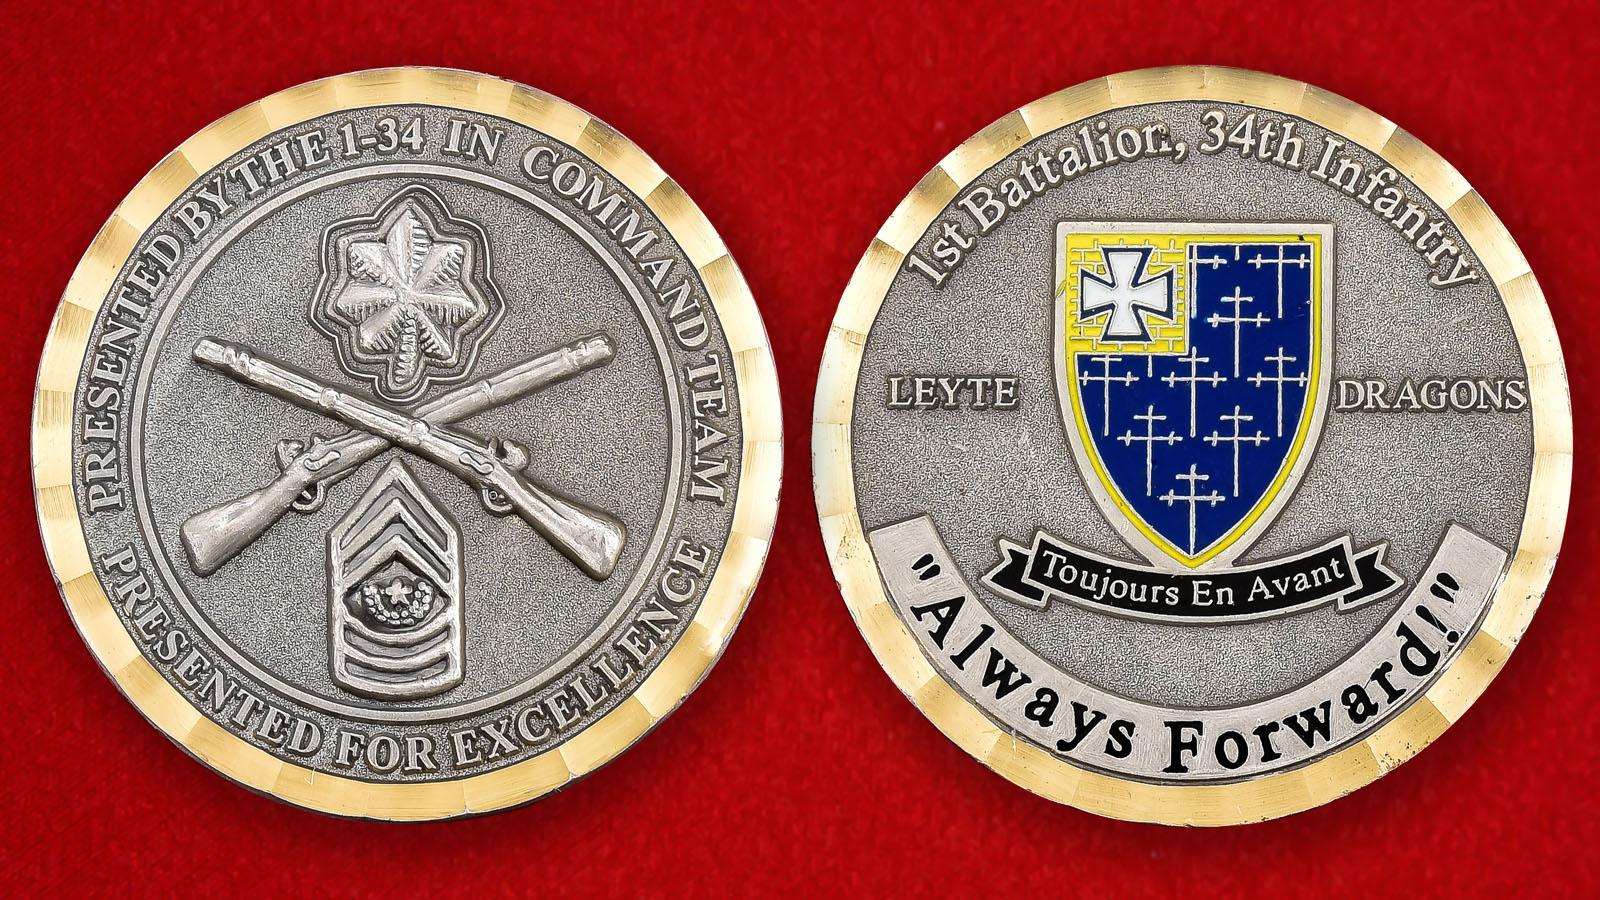 "Челлендж коин армии США ""1 батальон 34 пехотного полка Драконы Лейте"""""